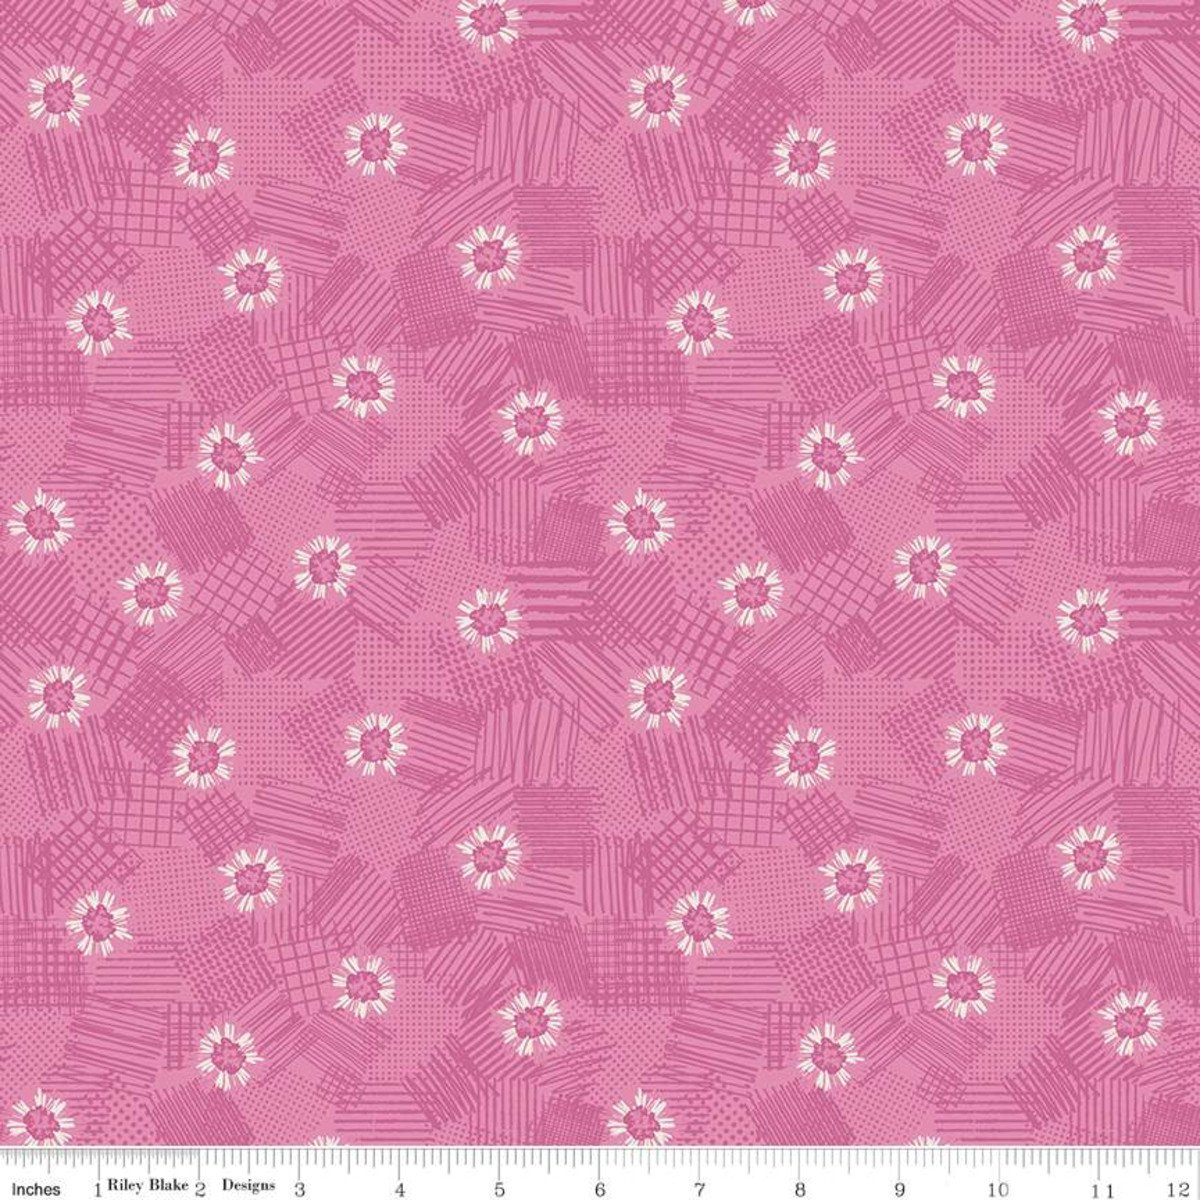 Meadow Lane Pink - C10123